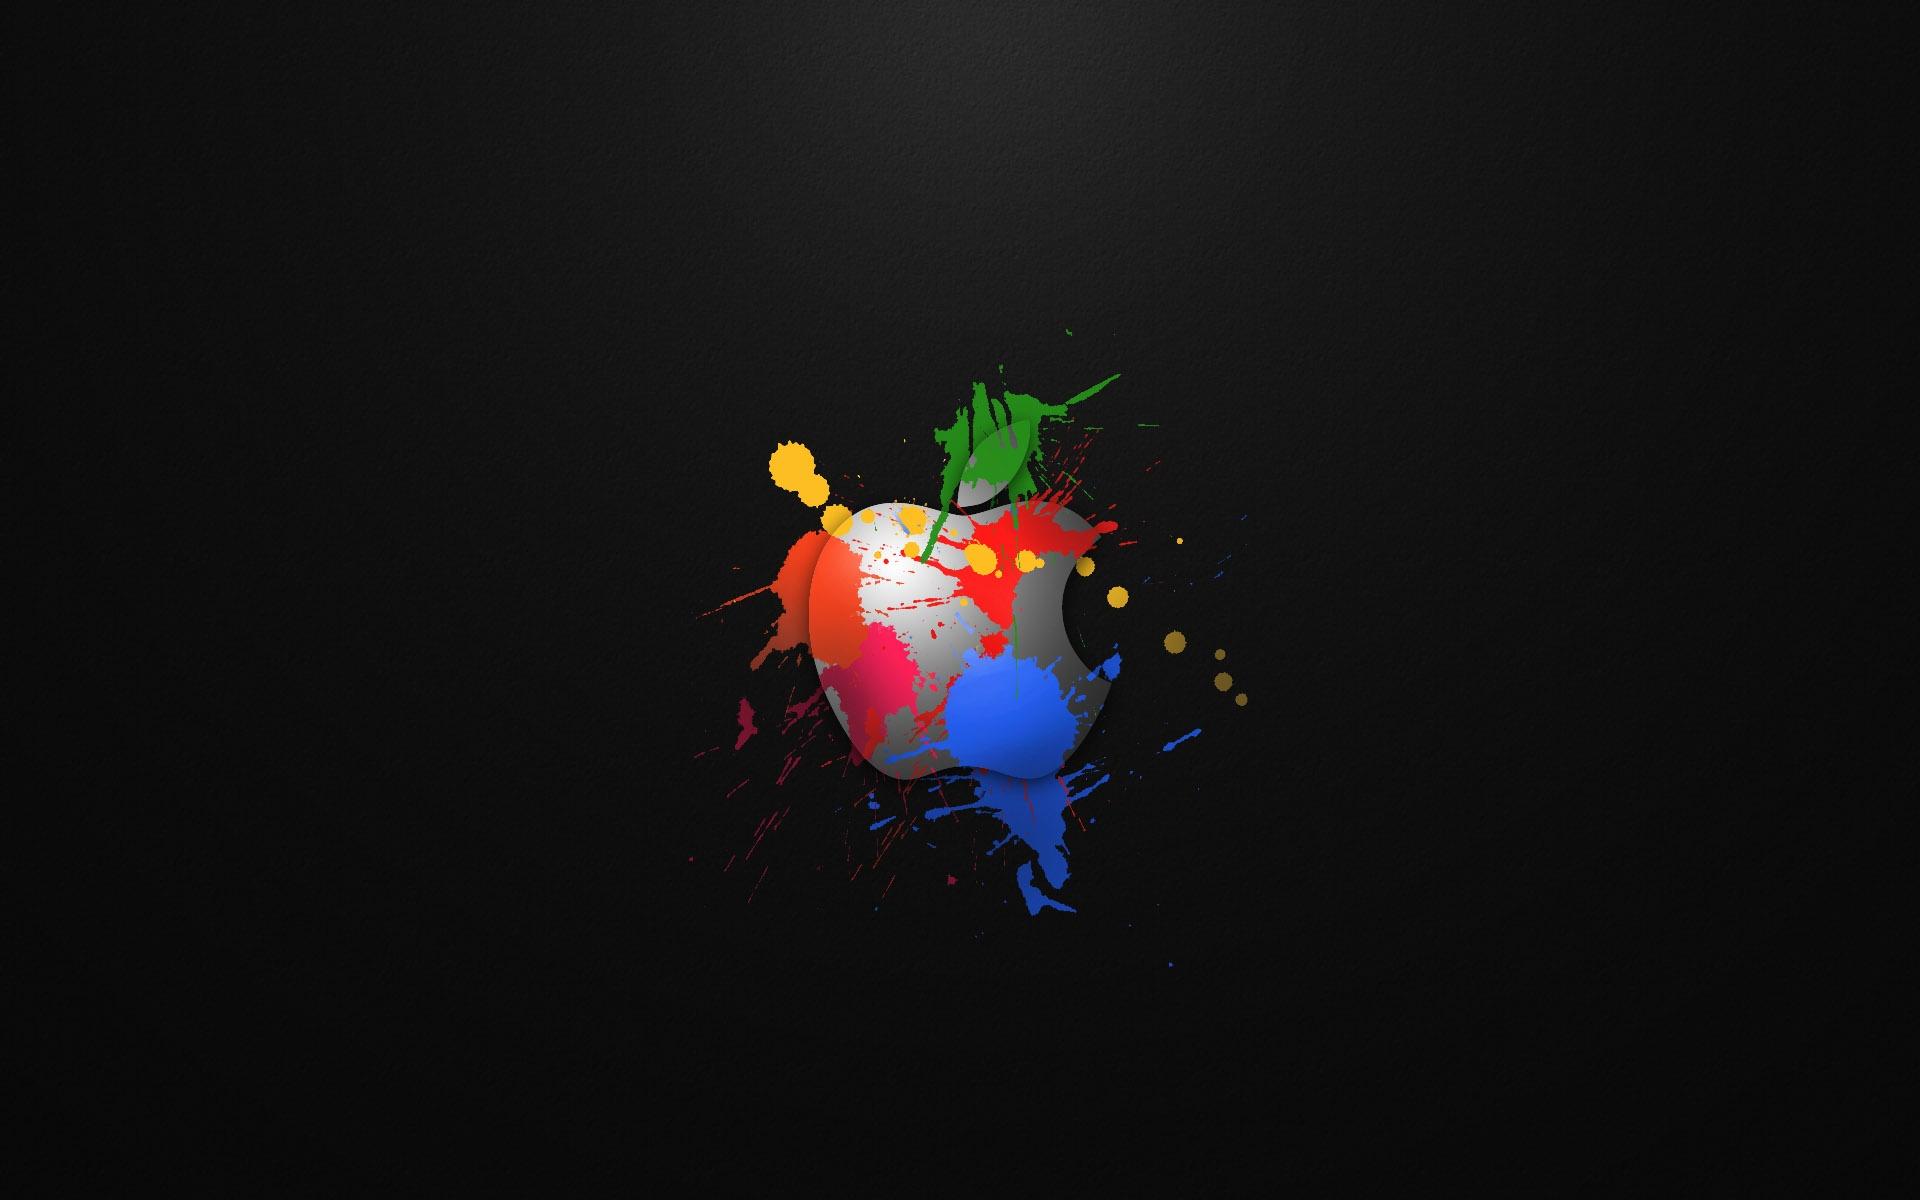 Desktop wallpaper apple hd   WallpaperAsk 1920x1200